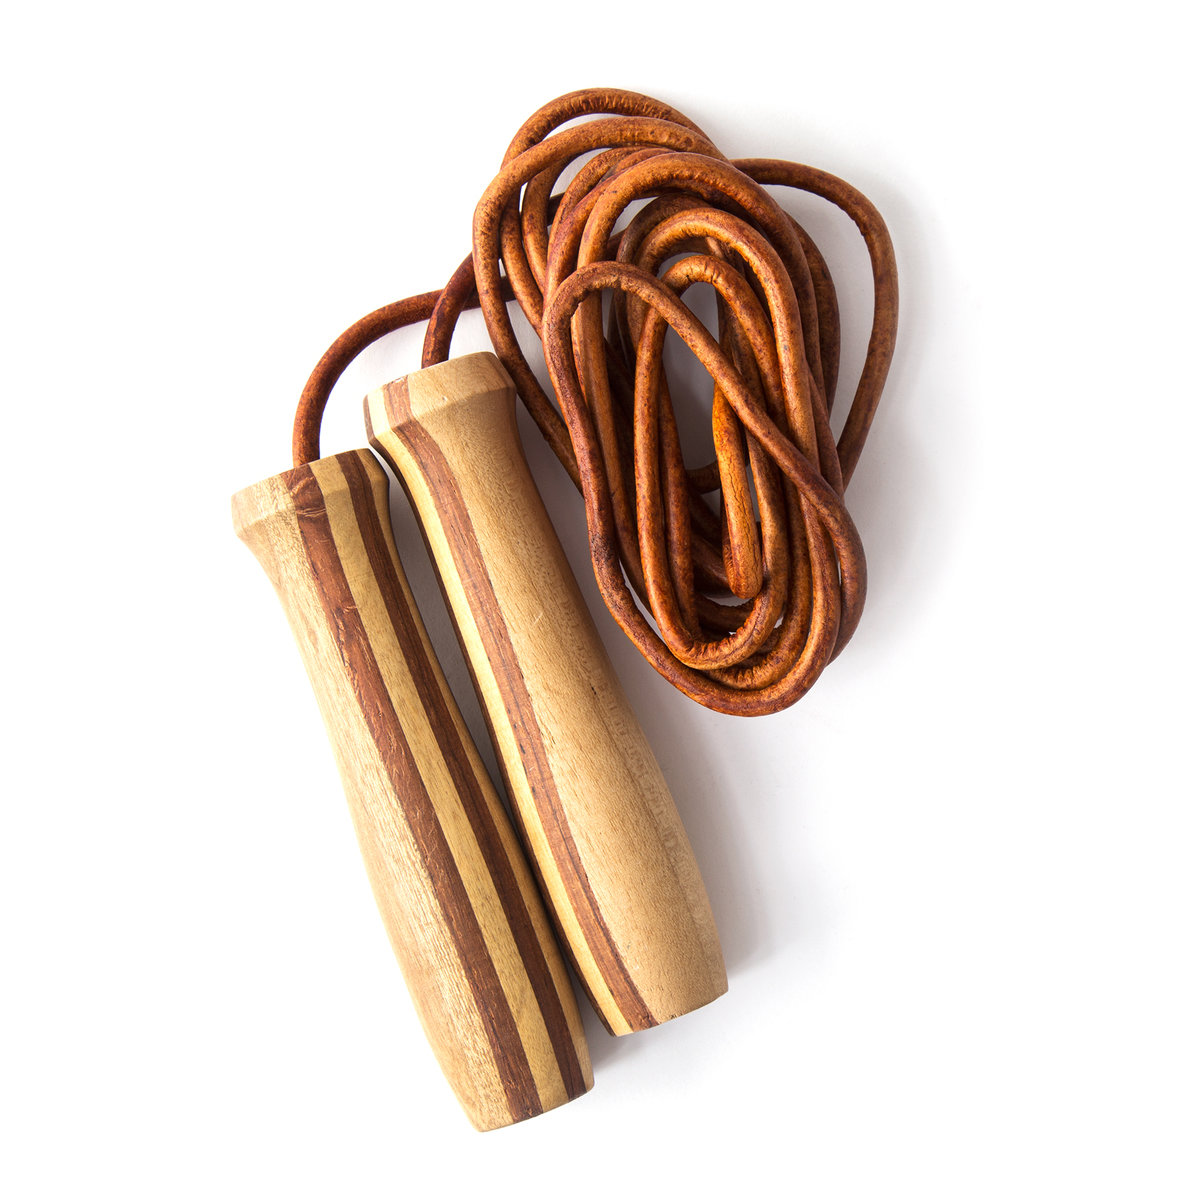 Hella Slingshots Wooden Jump Rope